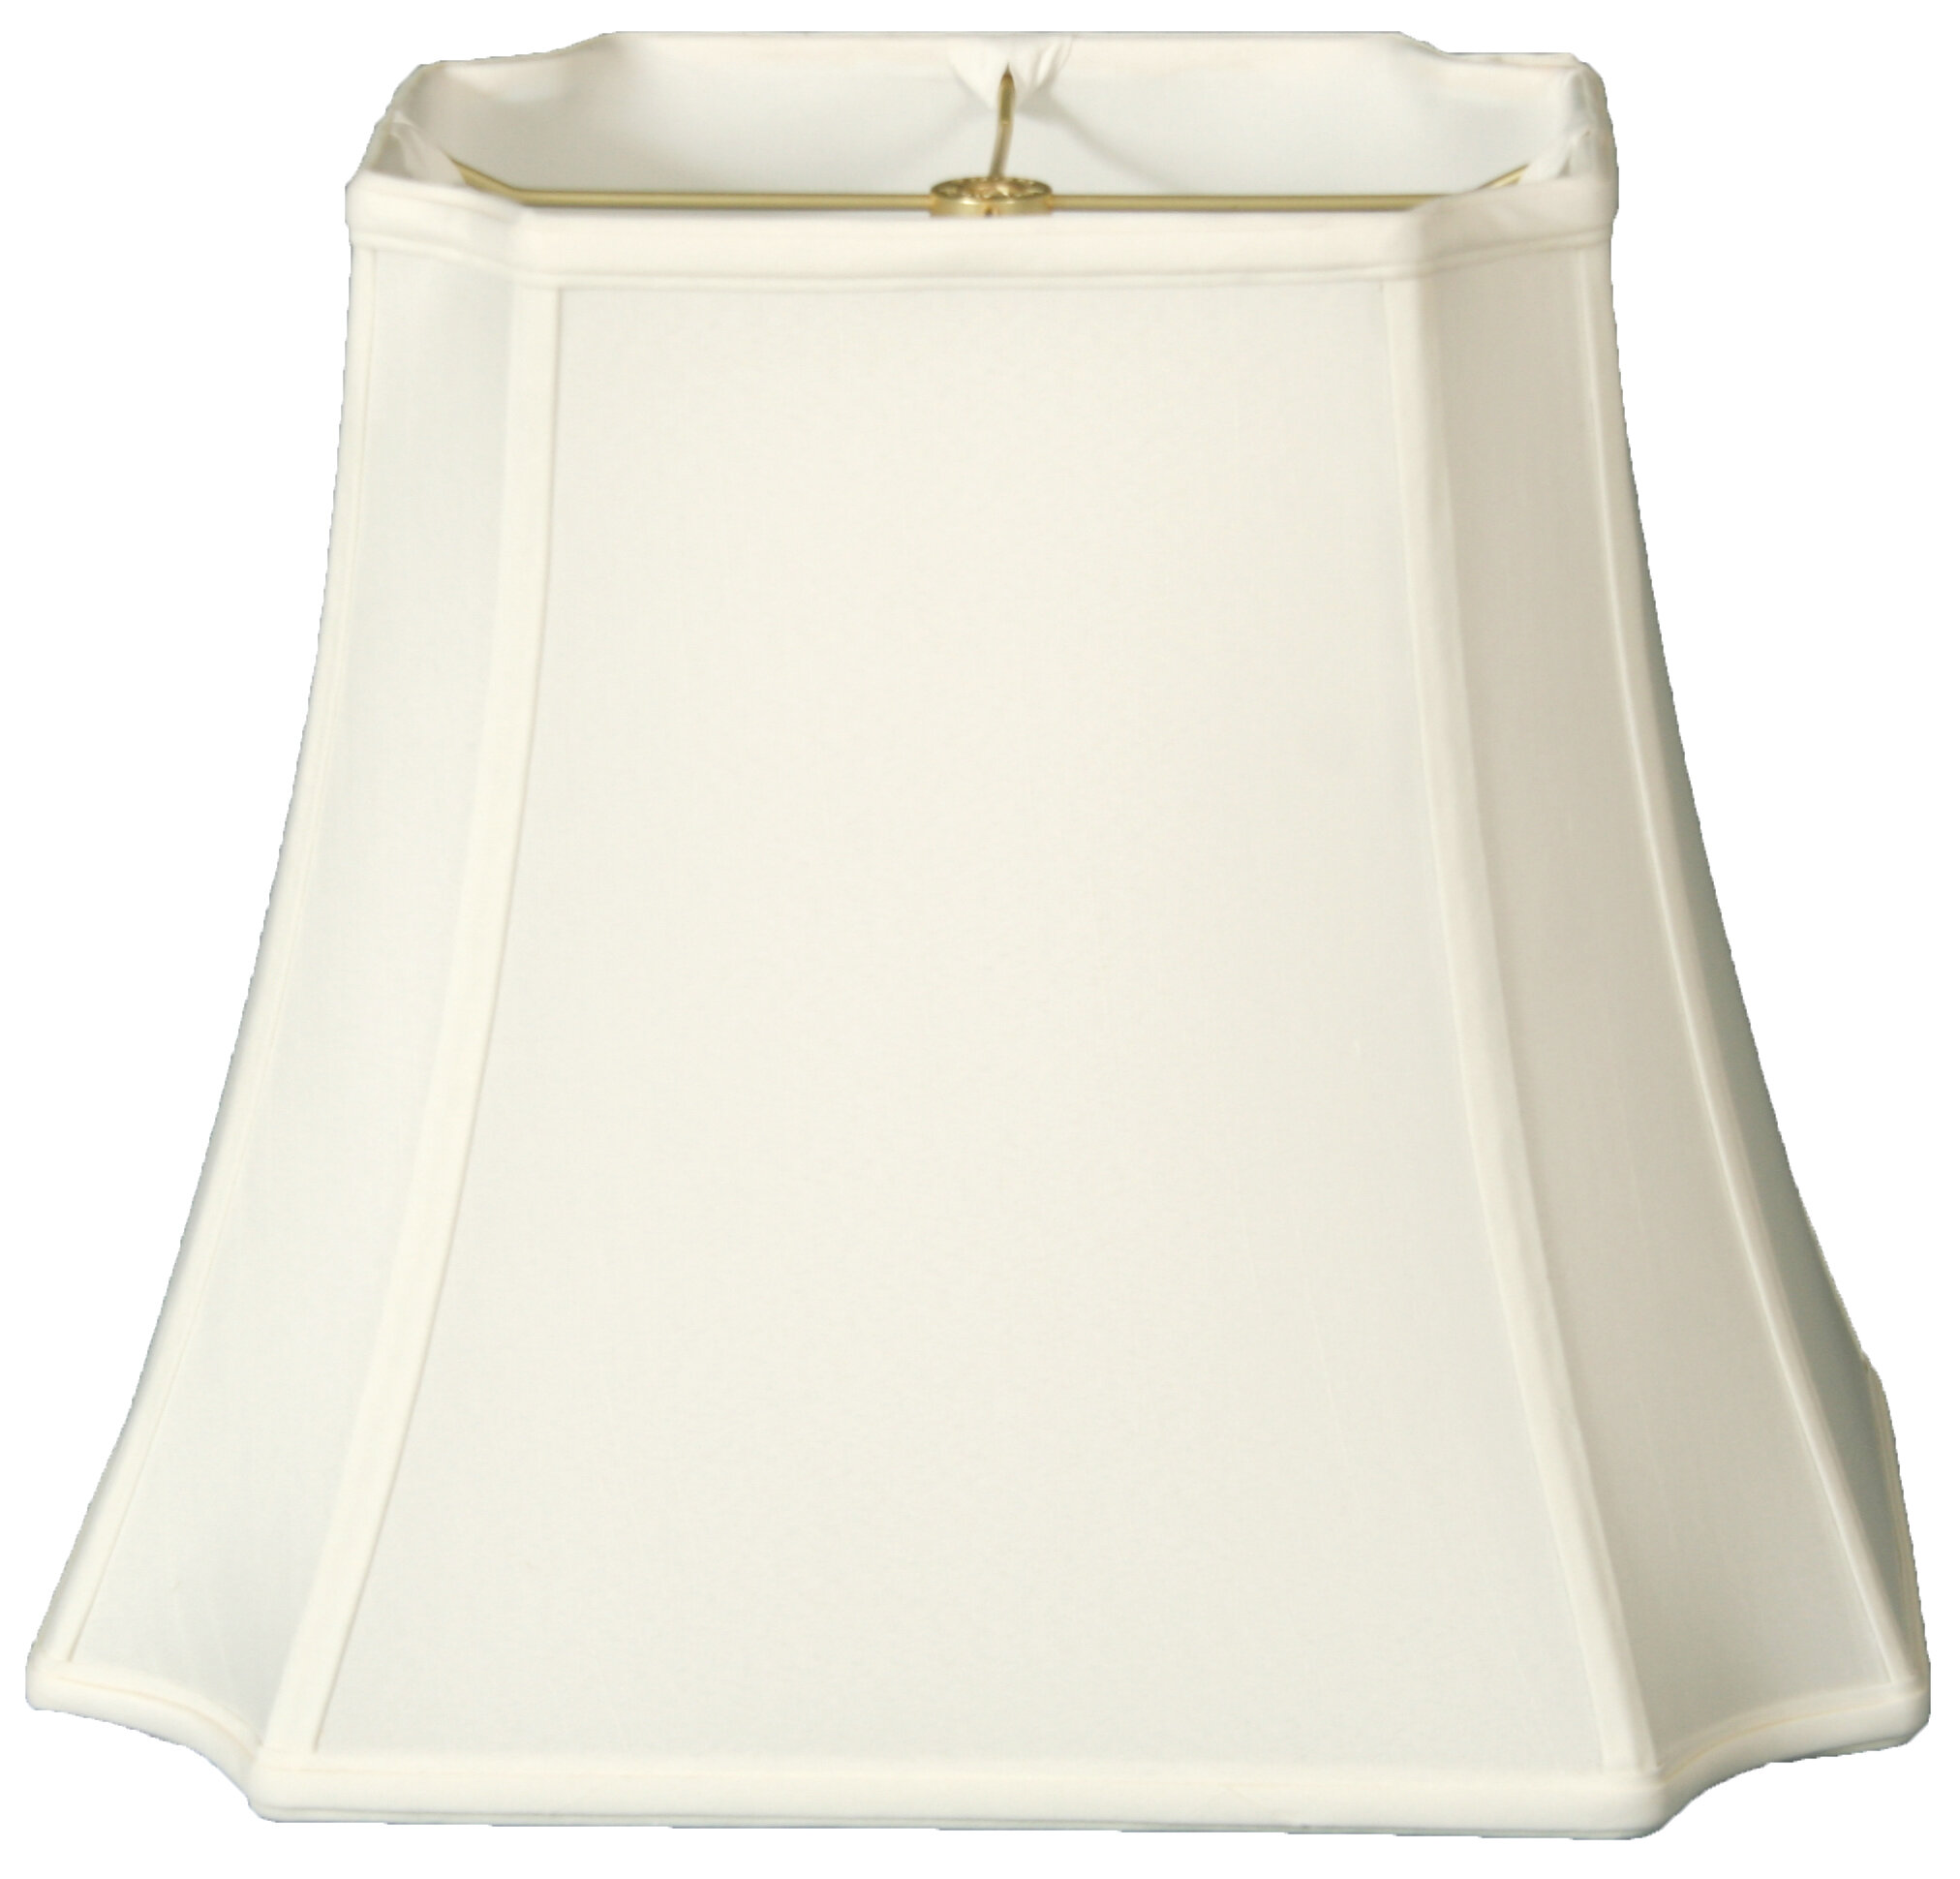 Royaldesigns timeless 19 silk bell lamp shade reviews wayfair aloadofball Image collections